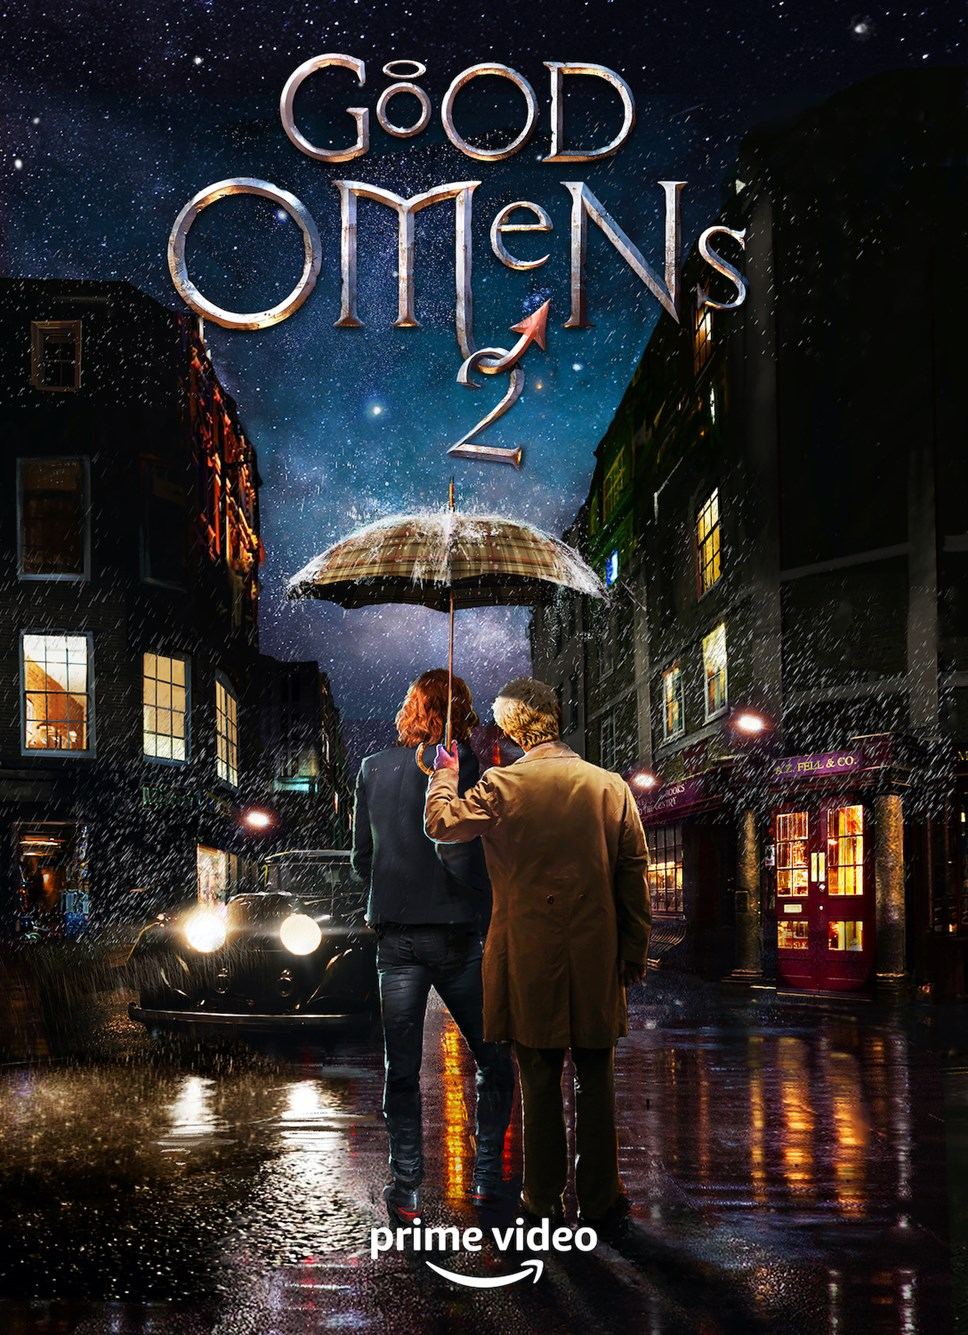 Good Omens Credit-Amazon Studios